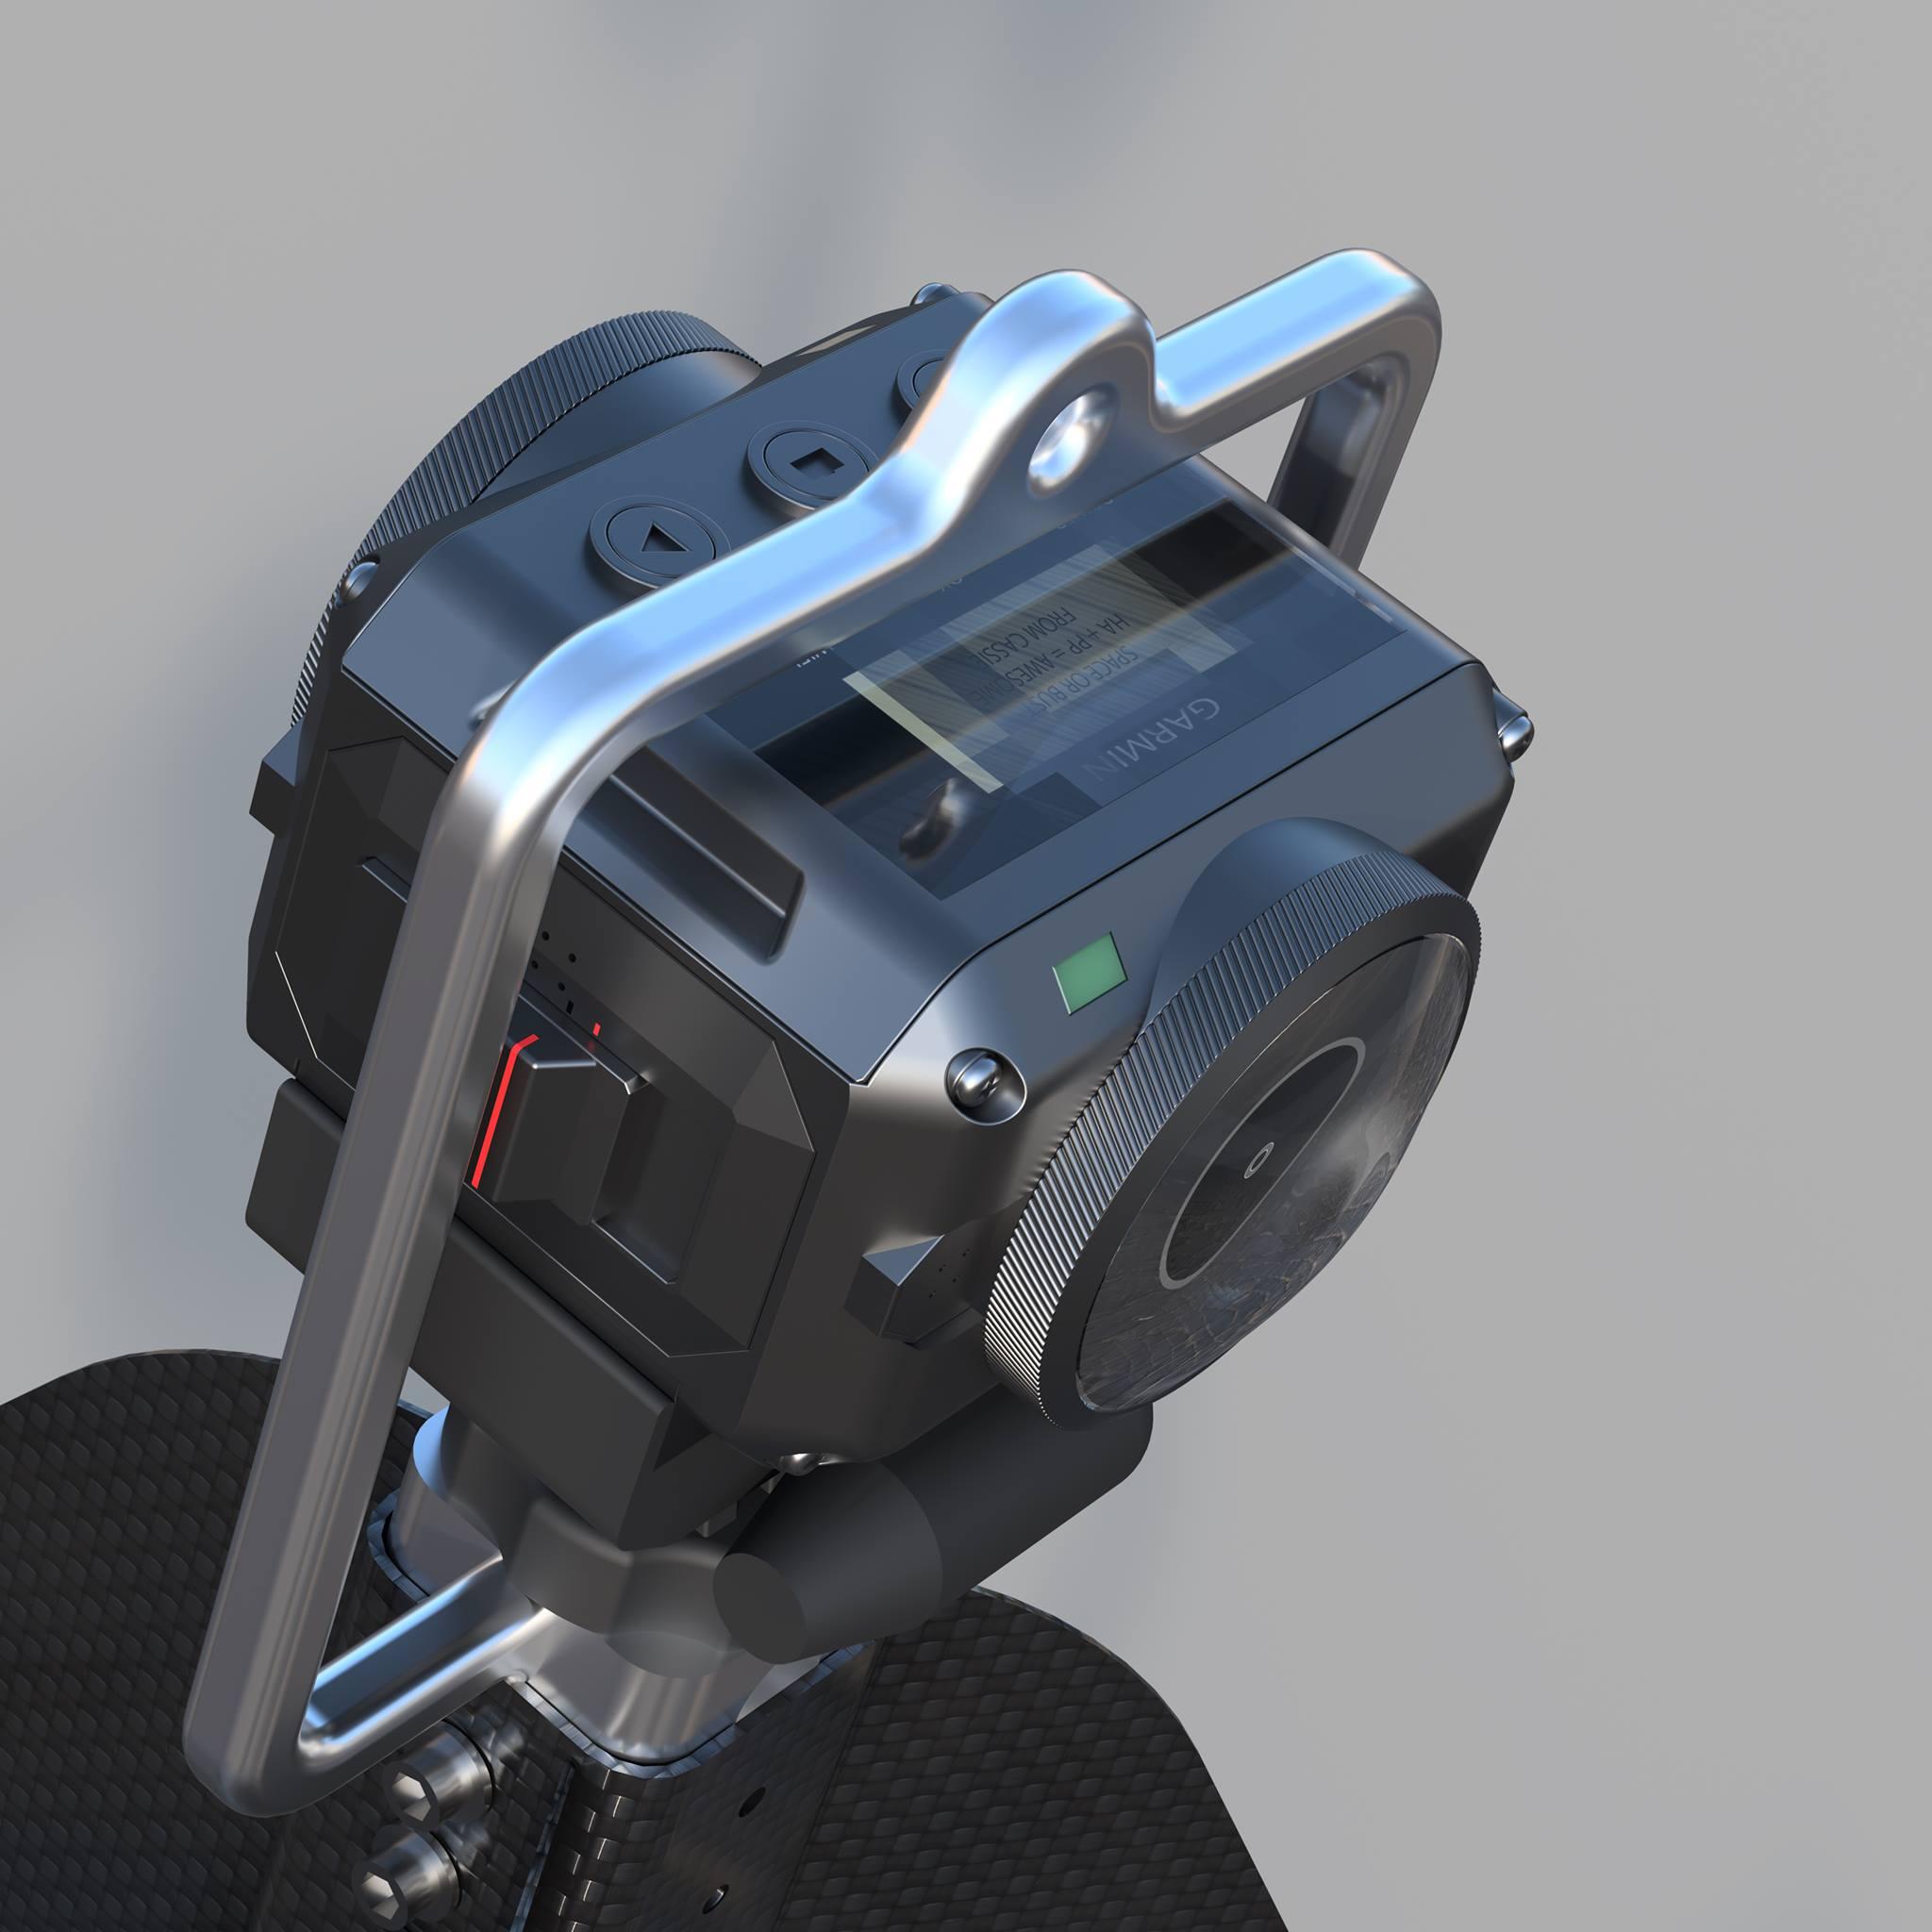 Garmin VIRB 360 mounted inside the balloon tether ring